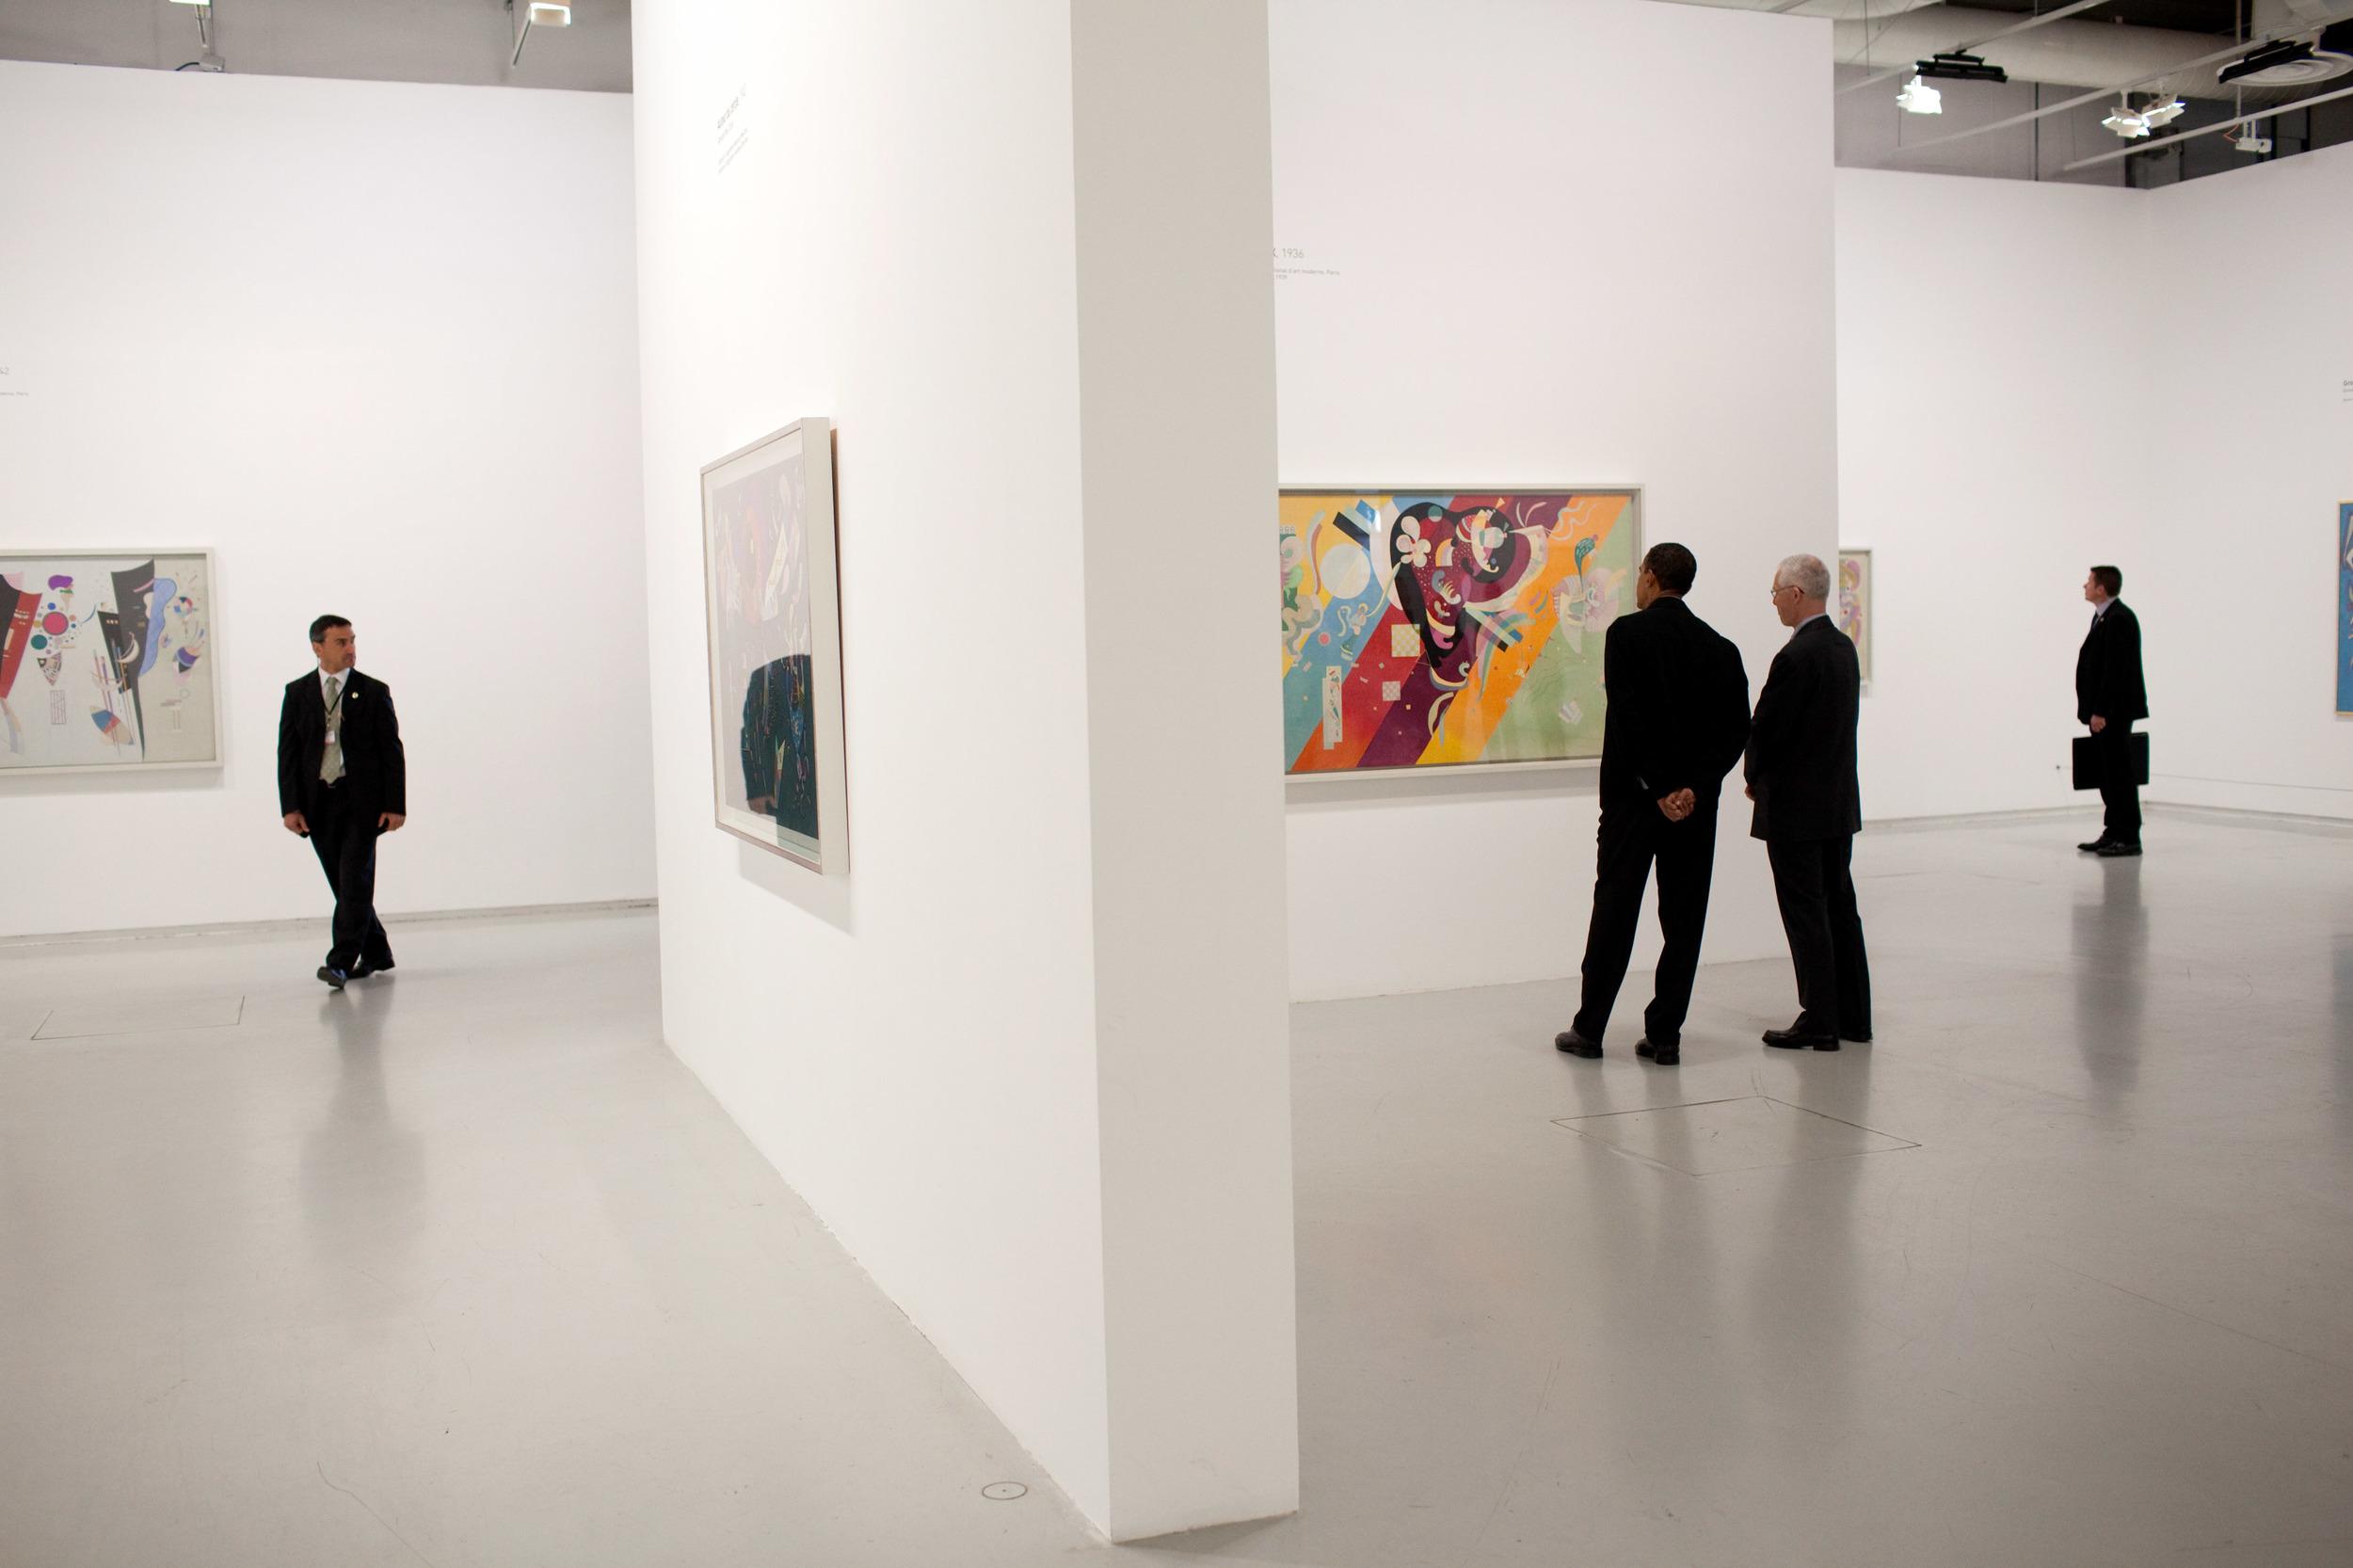 Barack_Obama_tours_the_Centre_Pompidou_modern_art_museum_2.jpg